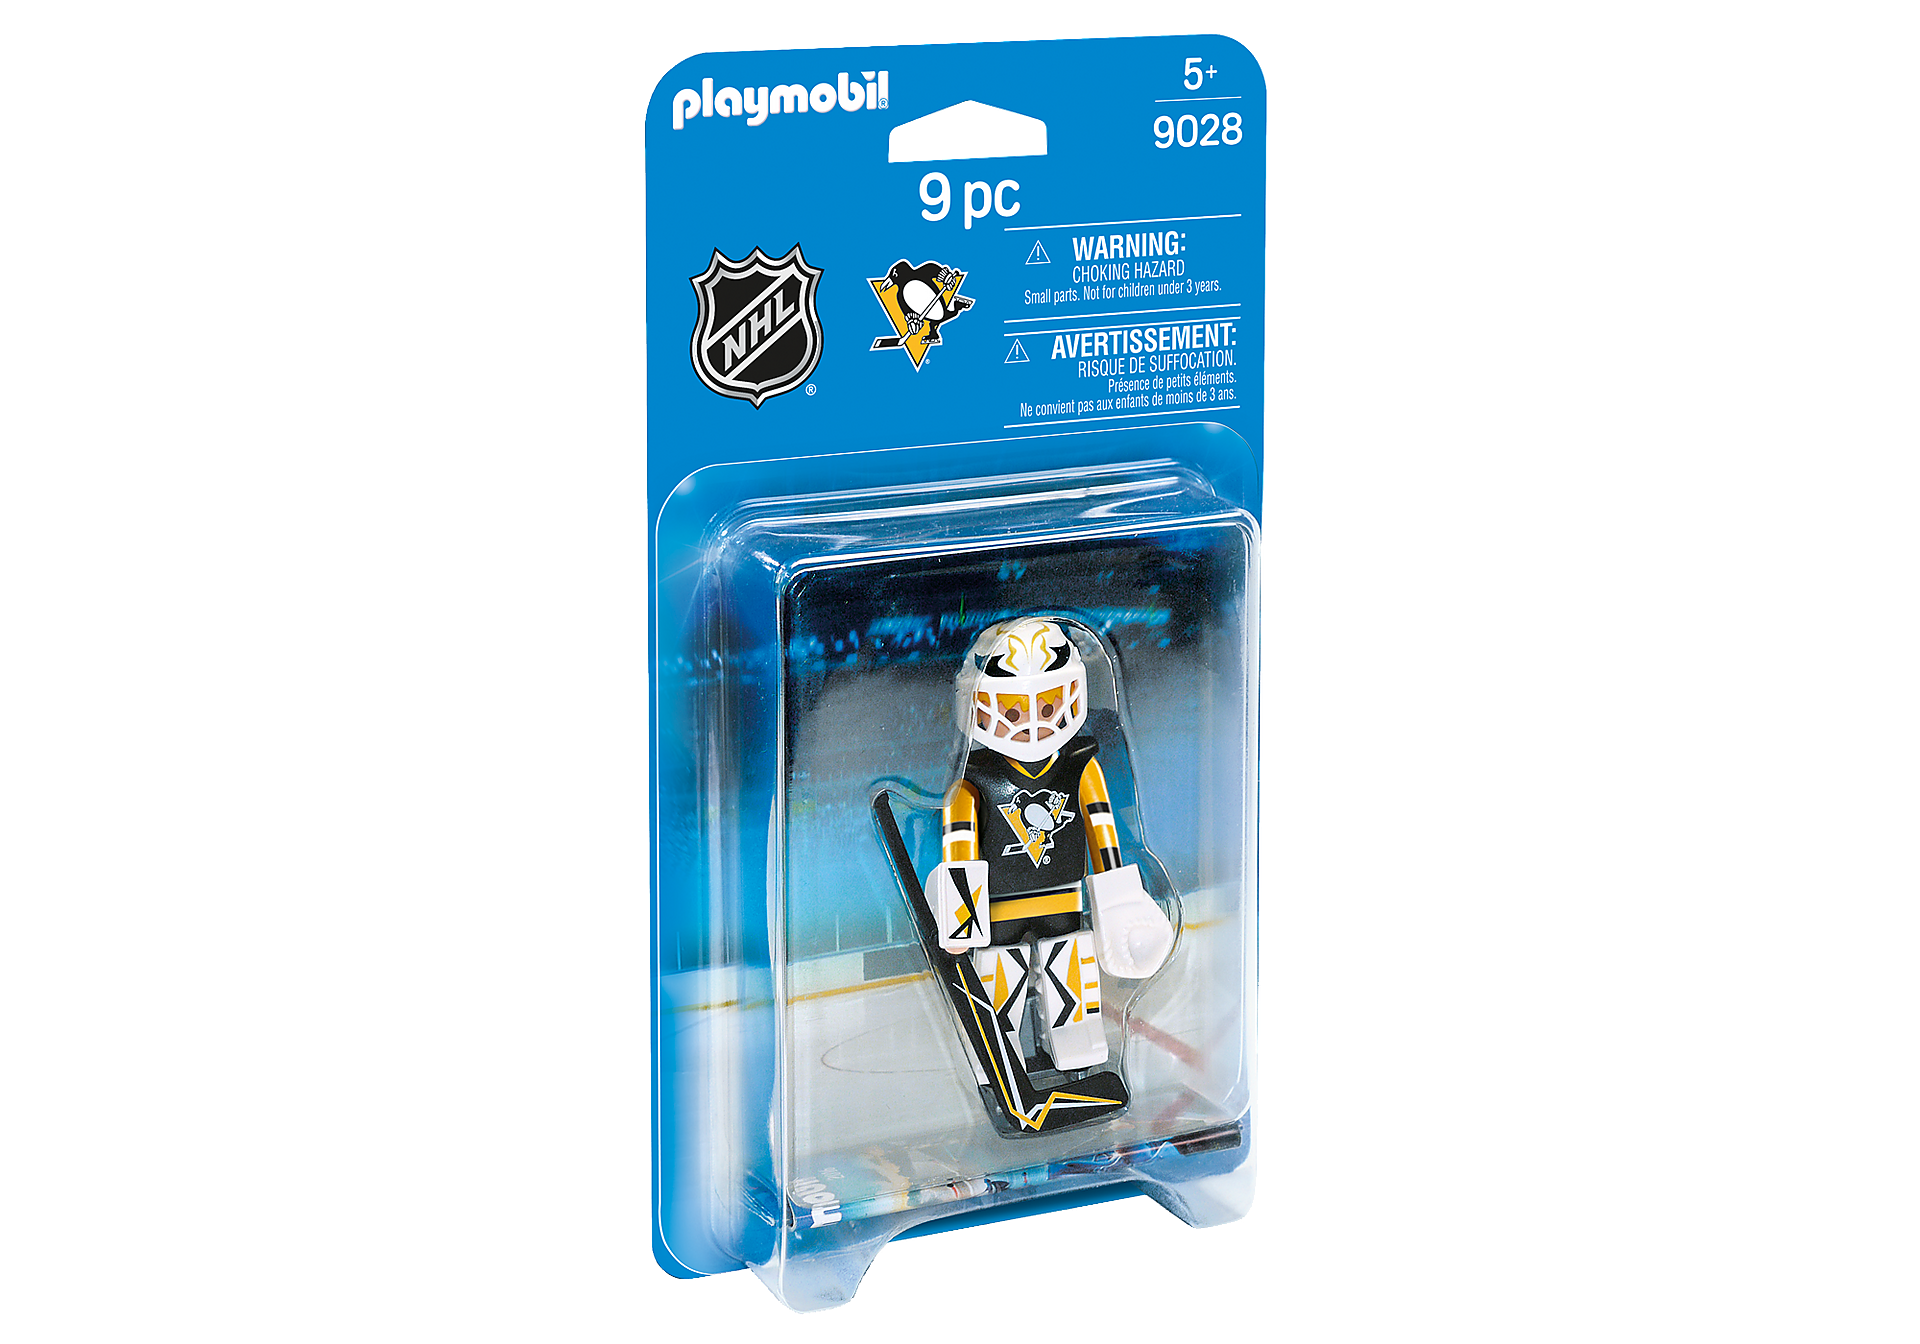 http://media.playmobil.com/i/playmobil/9028_product_box_front/NHL™ Pittsburgh Penguins™ Goalie